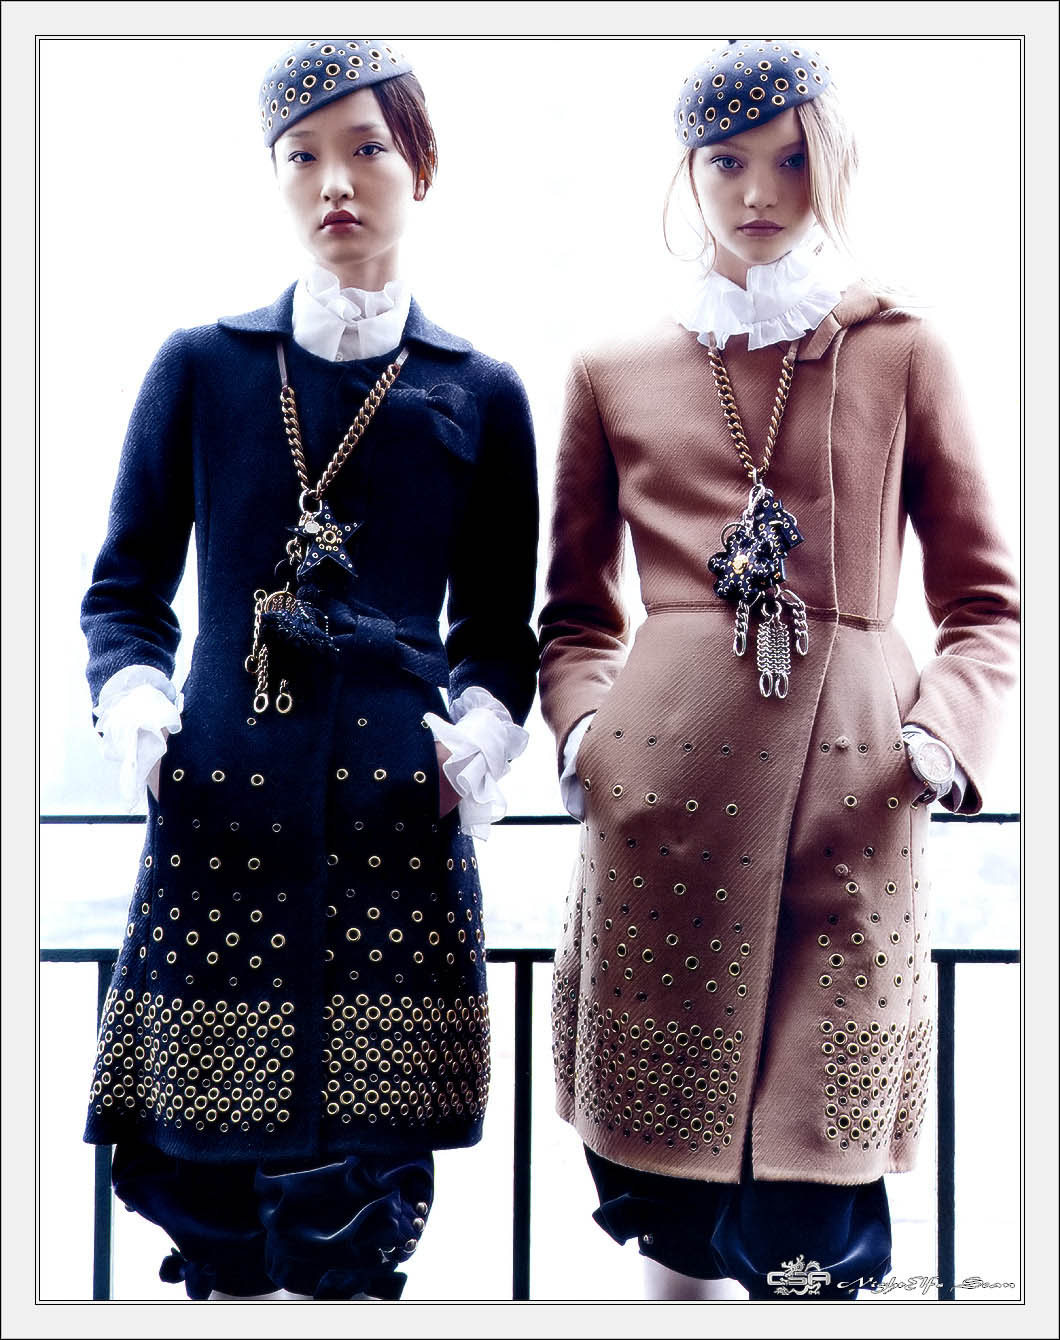 http://2.bp.blogspot.com/-beNERXpS-XA/TgSRH-_HkkI/AAAAAAAAAPo/pzNmSDWZjo4/s1600/Patrick+Demarchelier+%25C3%2597+Gemma+Ward+%2526+Chinese+Models+-+Vogue+China+September+2005+-+Shanghai+Diary+-+001.jpg